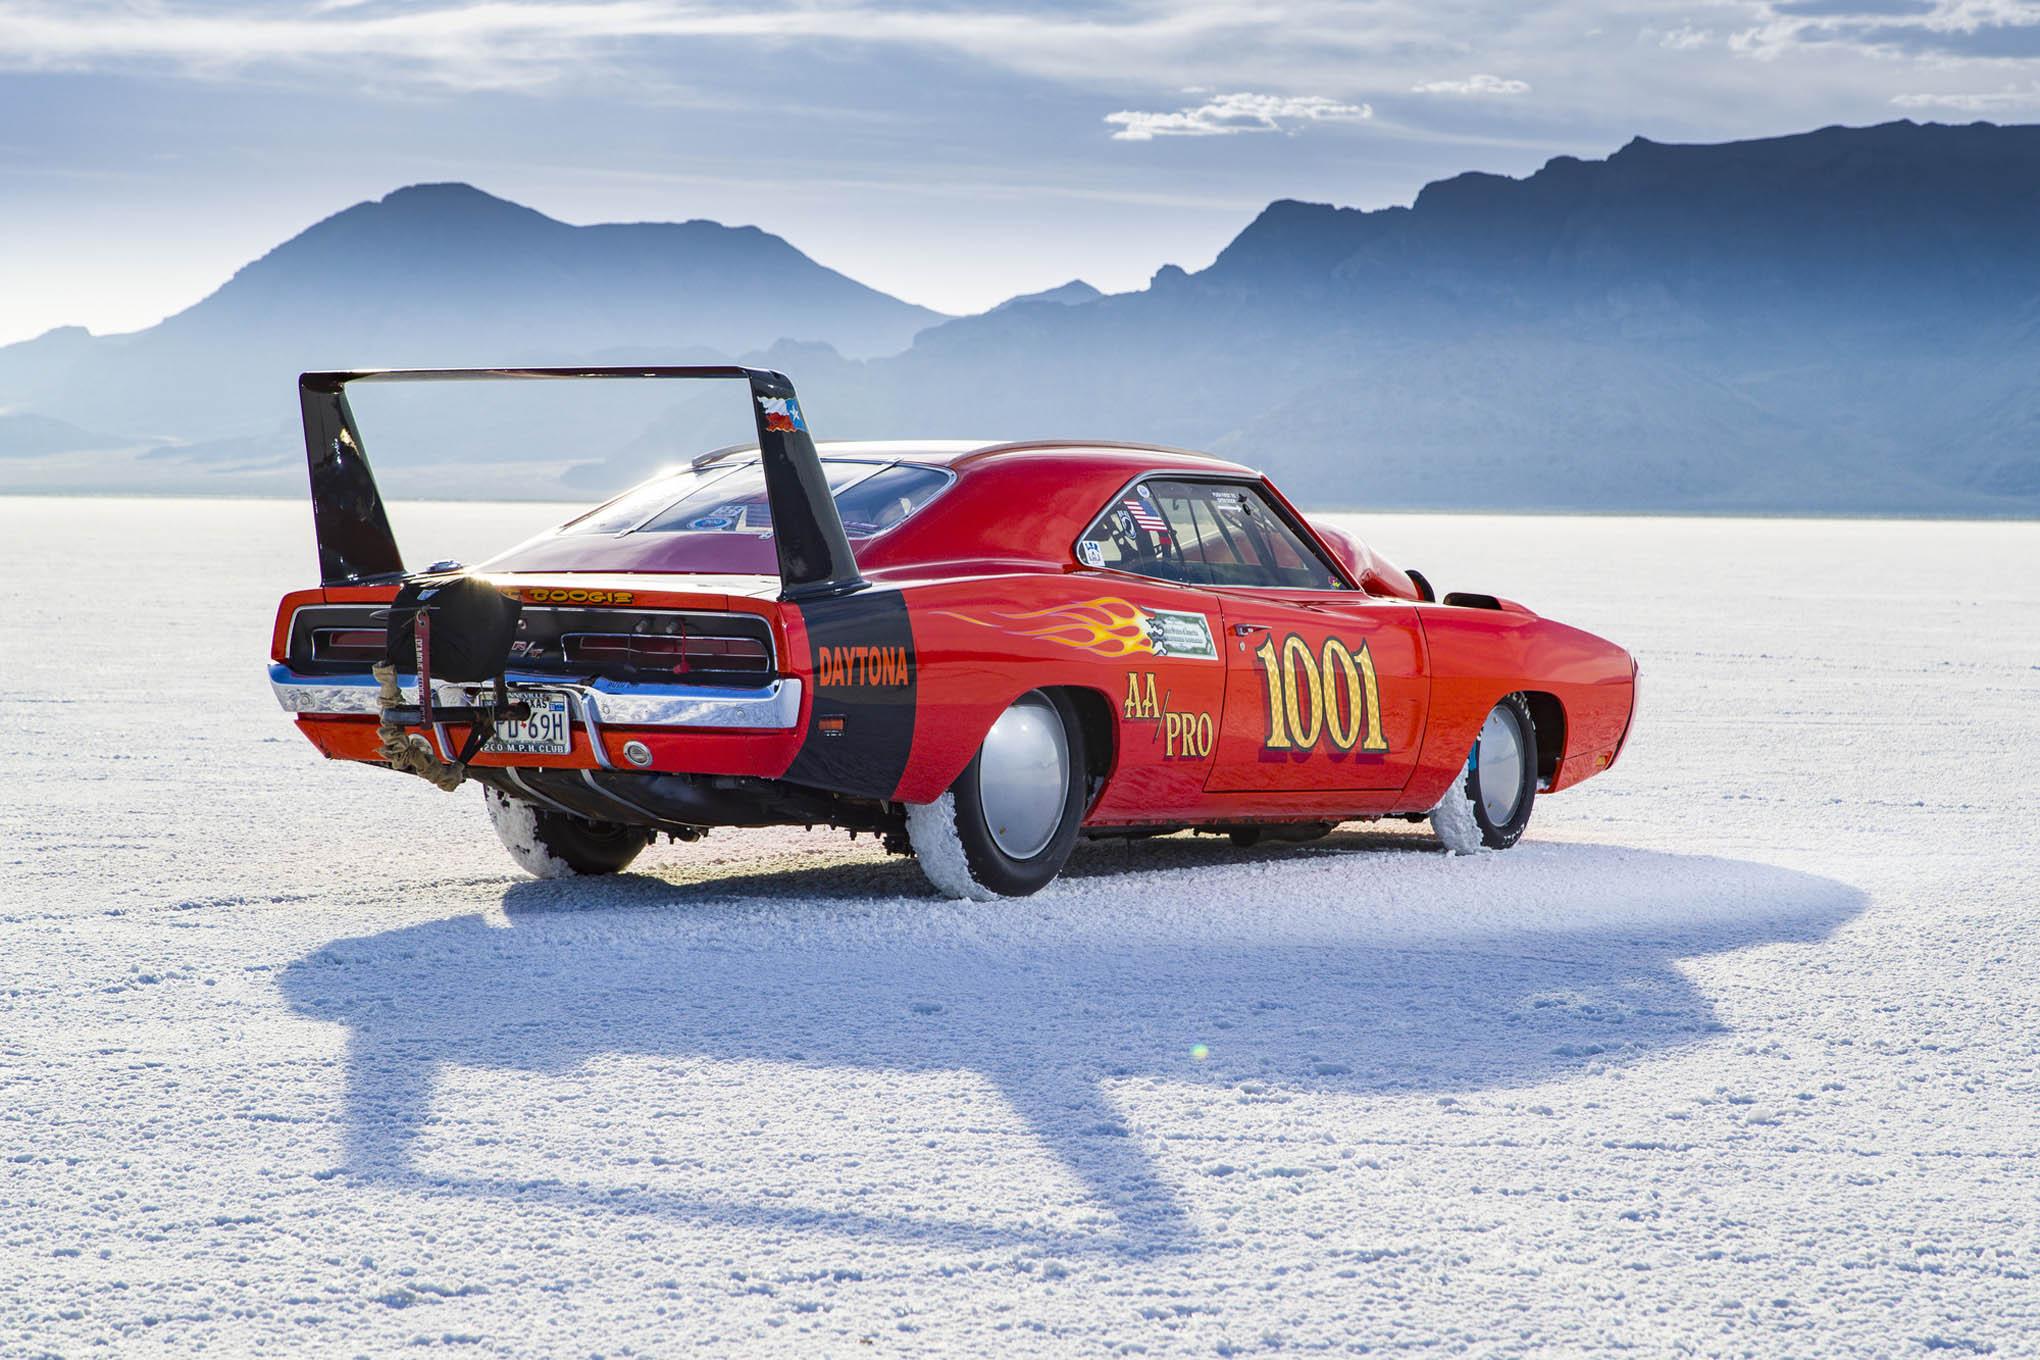 1969 Dodge Charger Daytona Papel De Parede Hd Plano De Fundo 2040x1360 Id 755982 Wallpaper Abyss